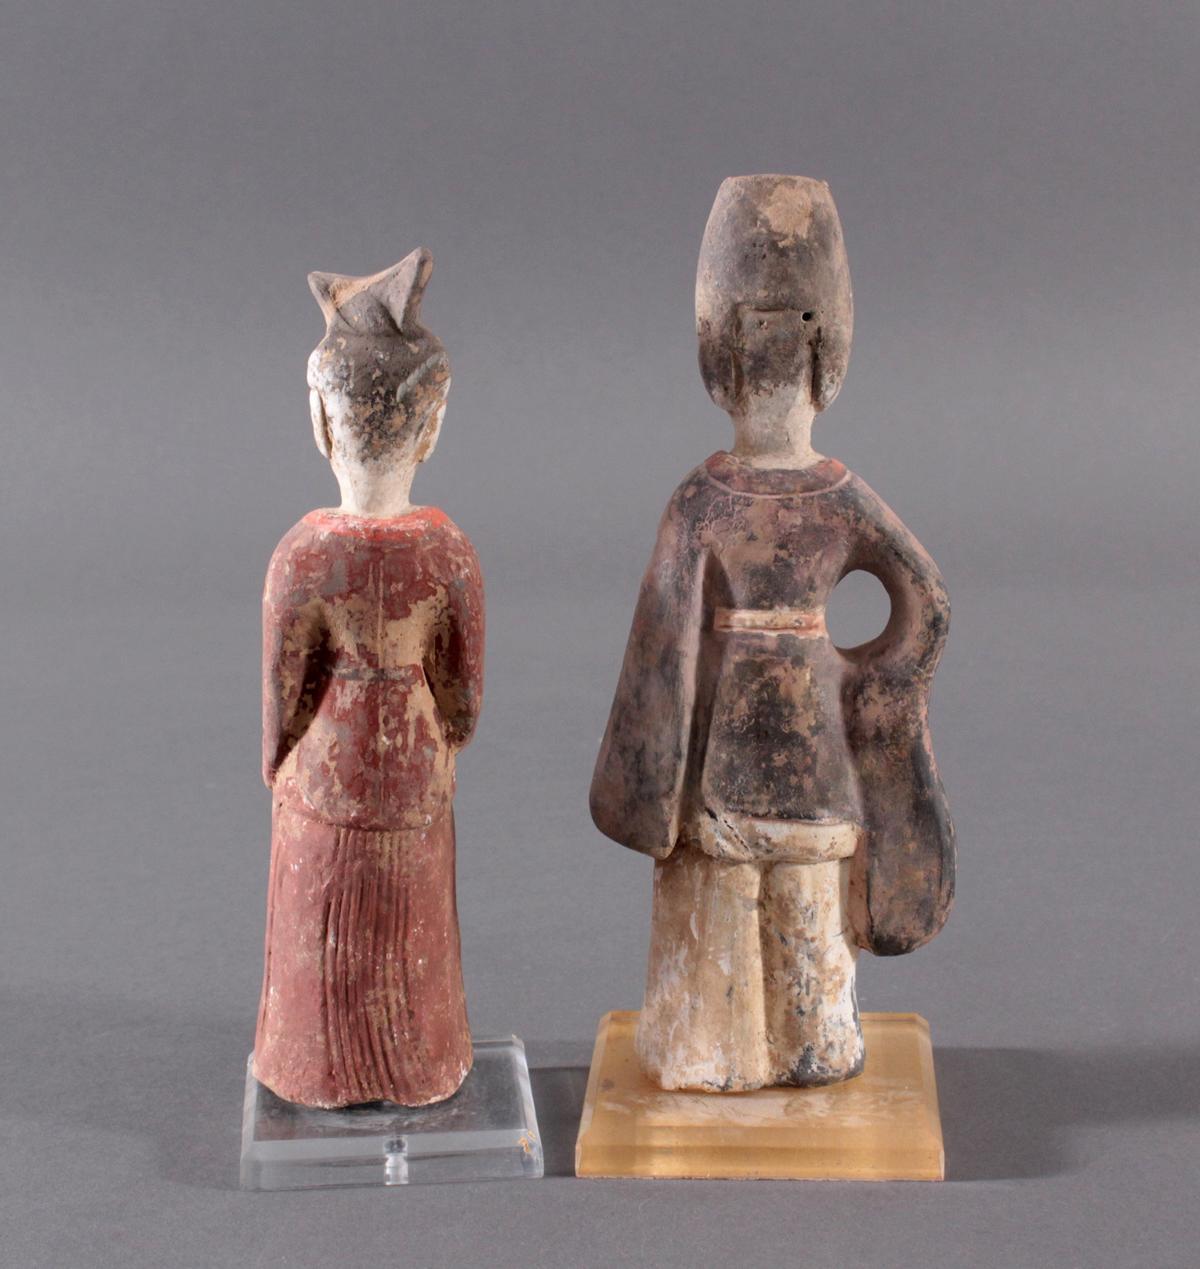 China TANG-Dynastie, 2 Figuren aus Ton-2